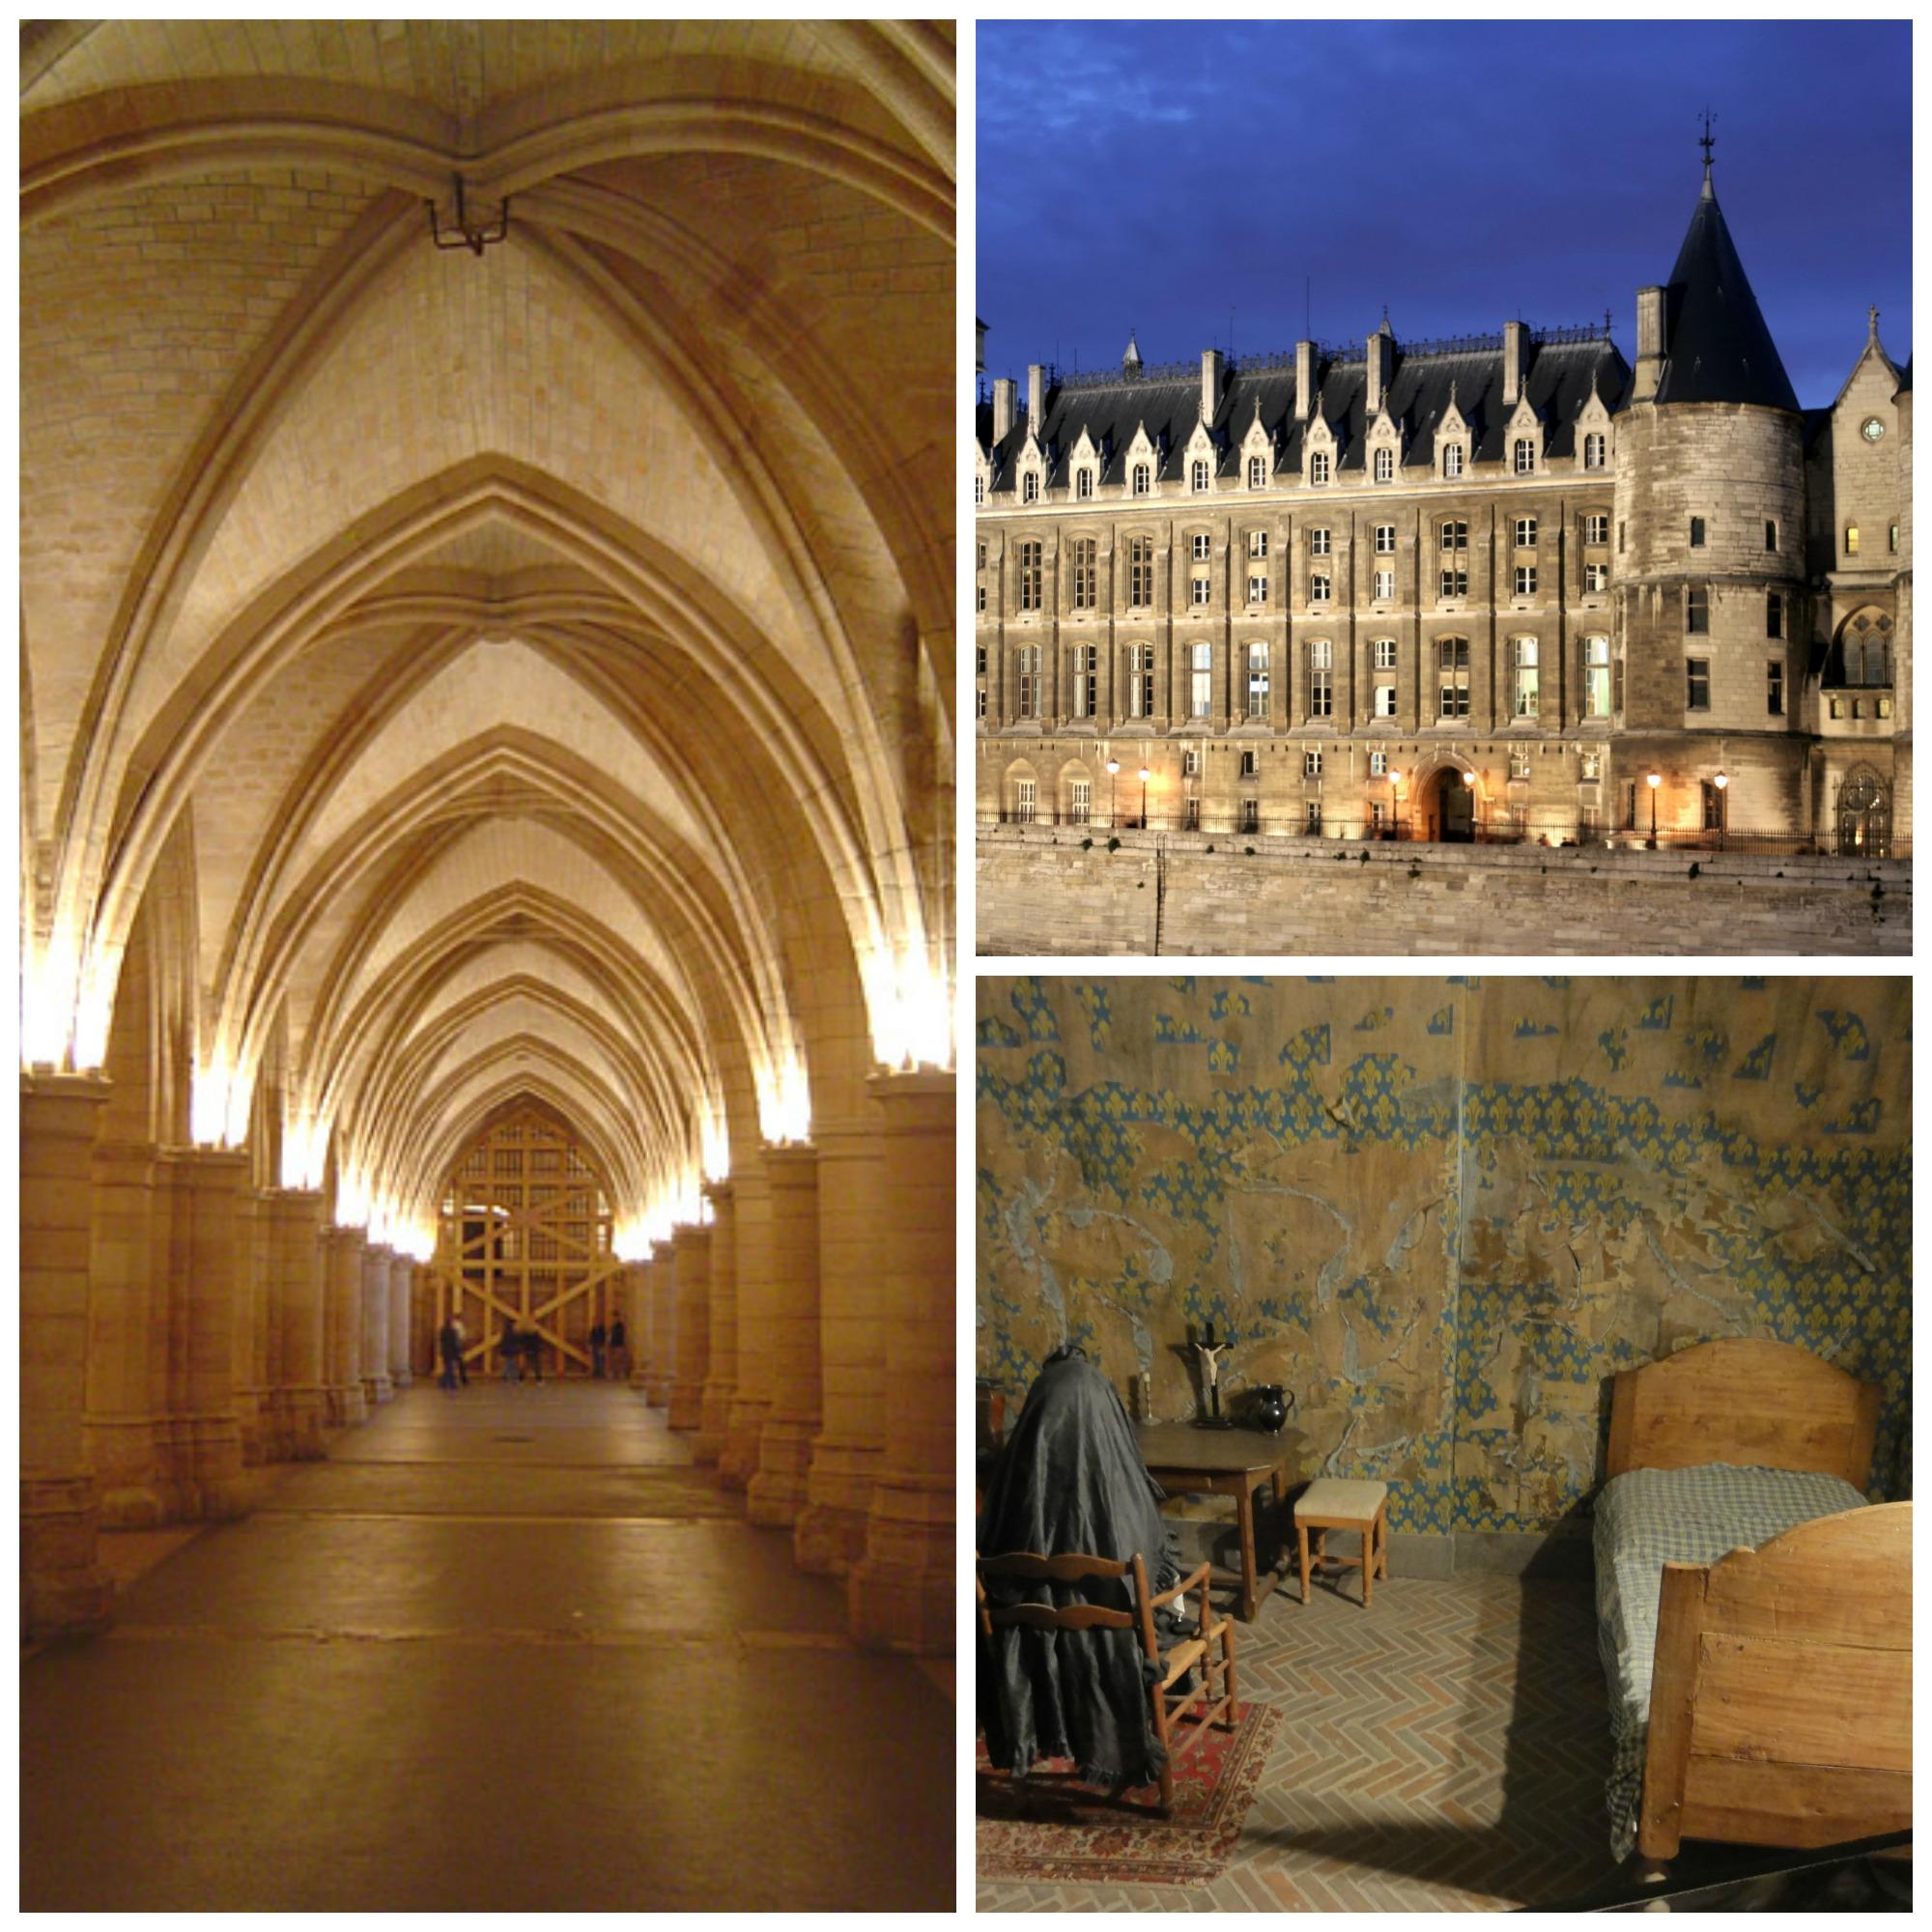 The History Of La Conciergerie In 1 Minute